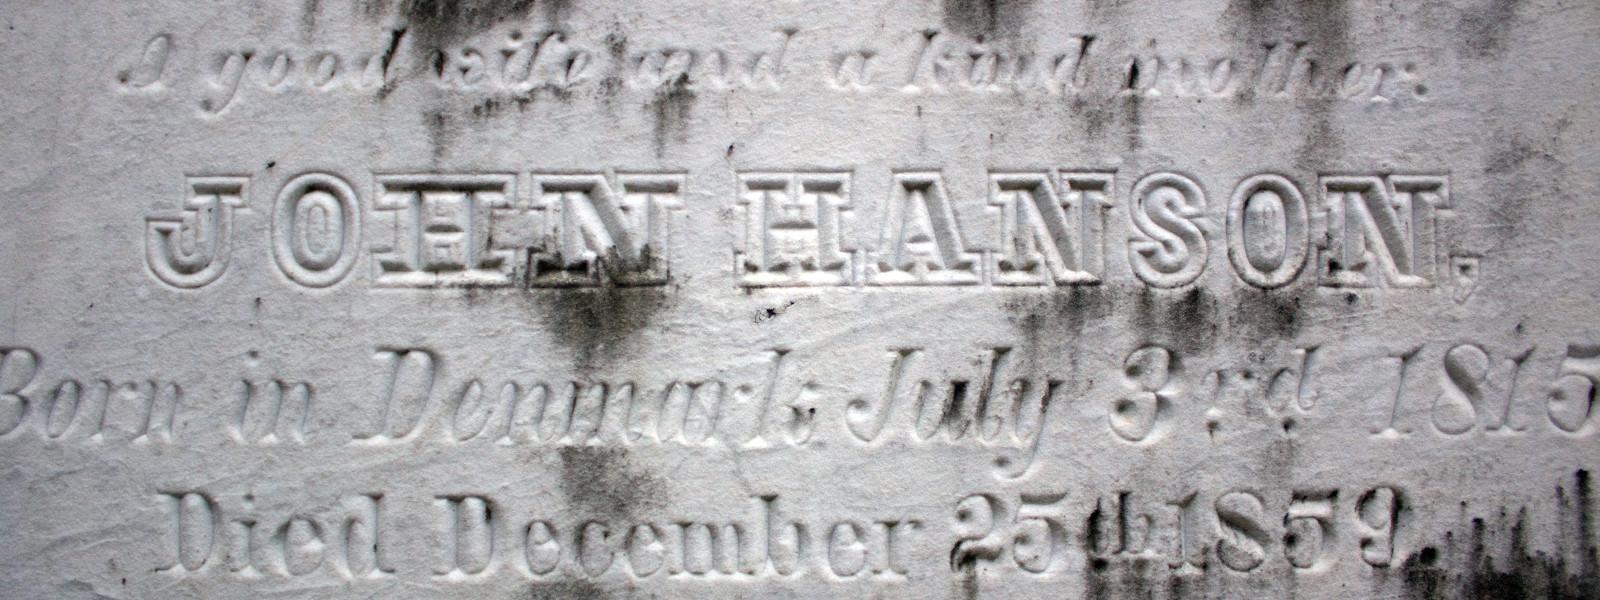 Lafayette cemetery found type.